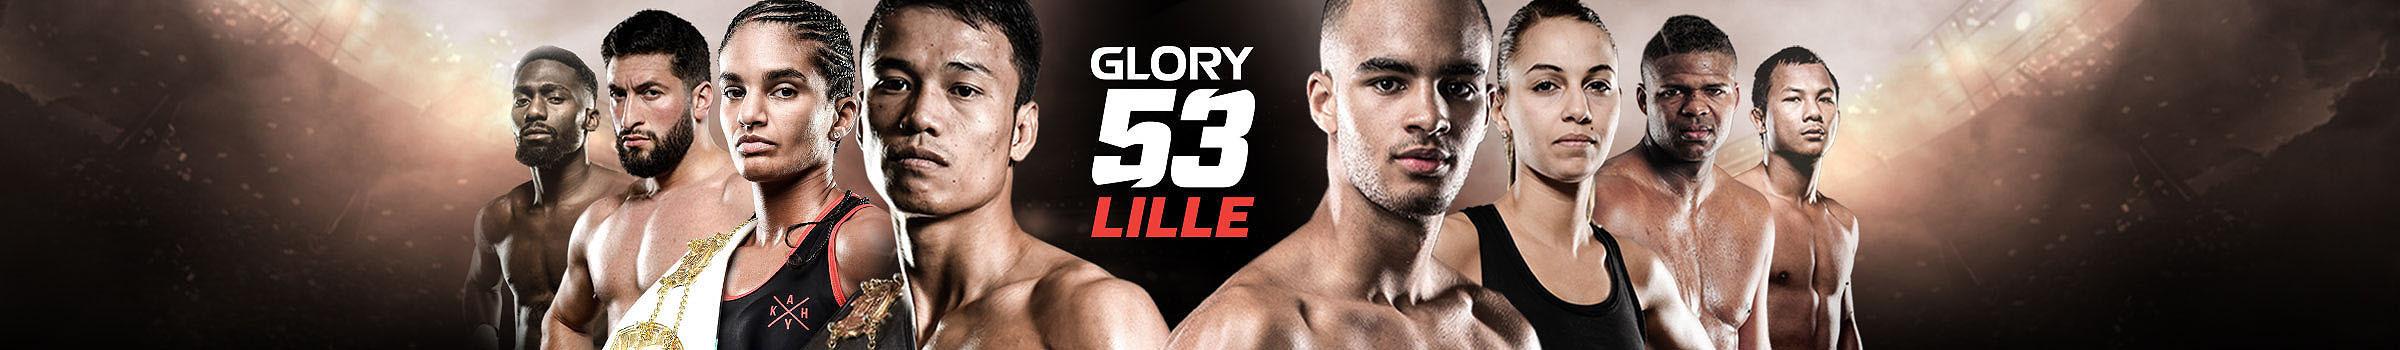 GLORY 53 Lille